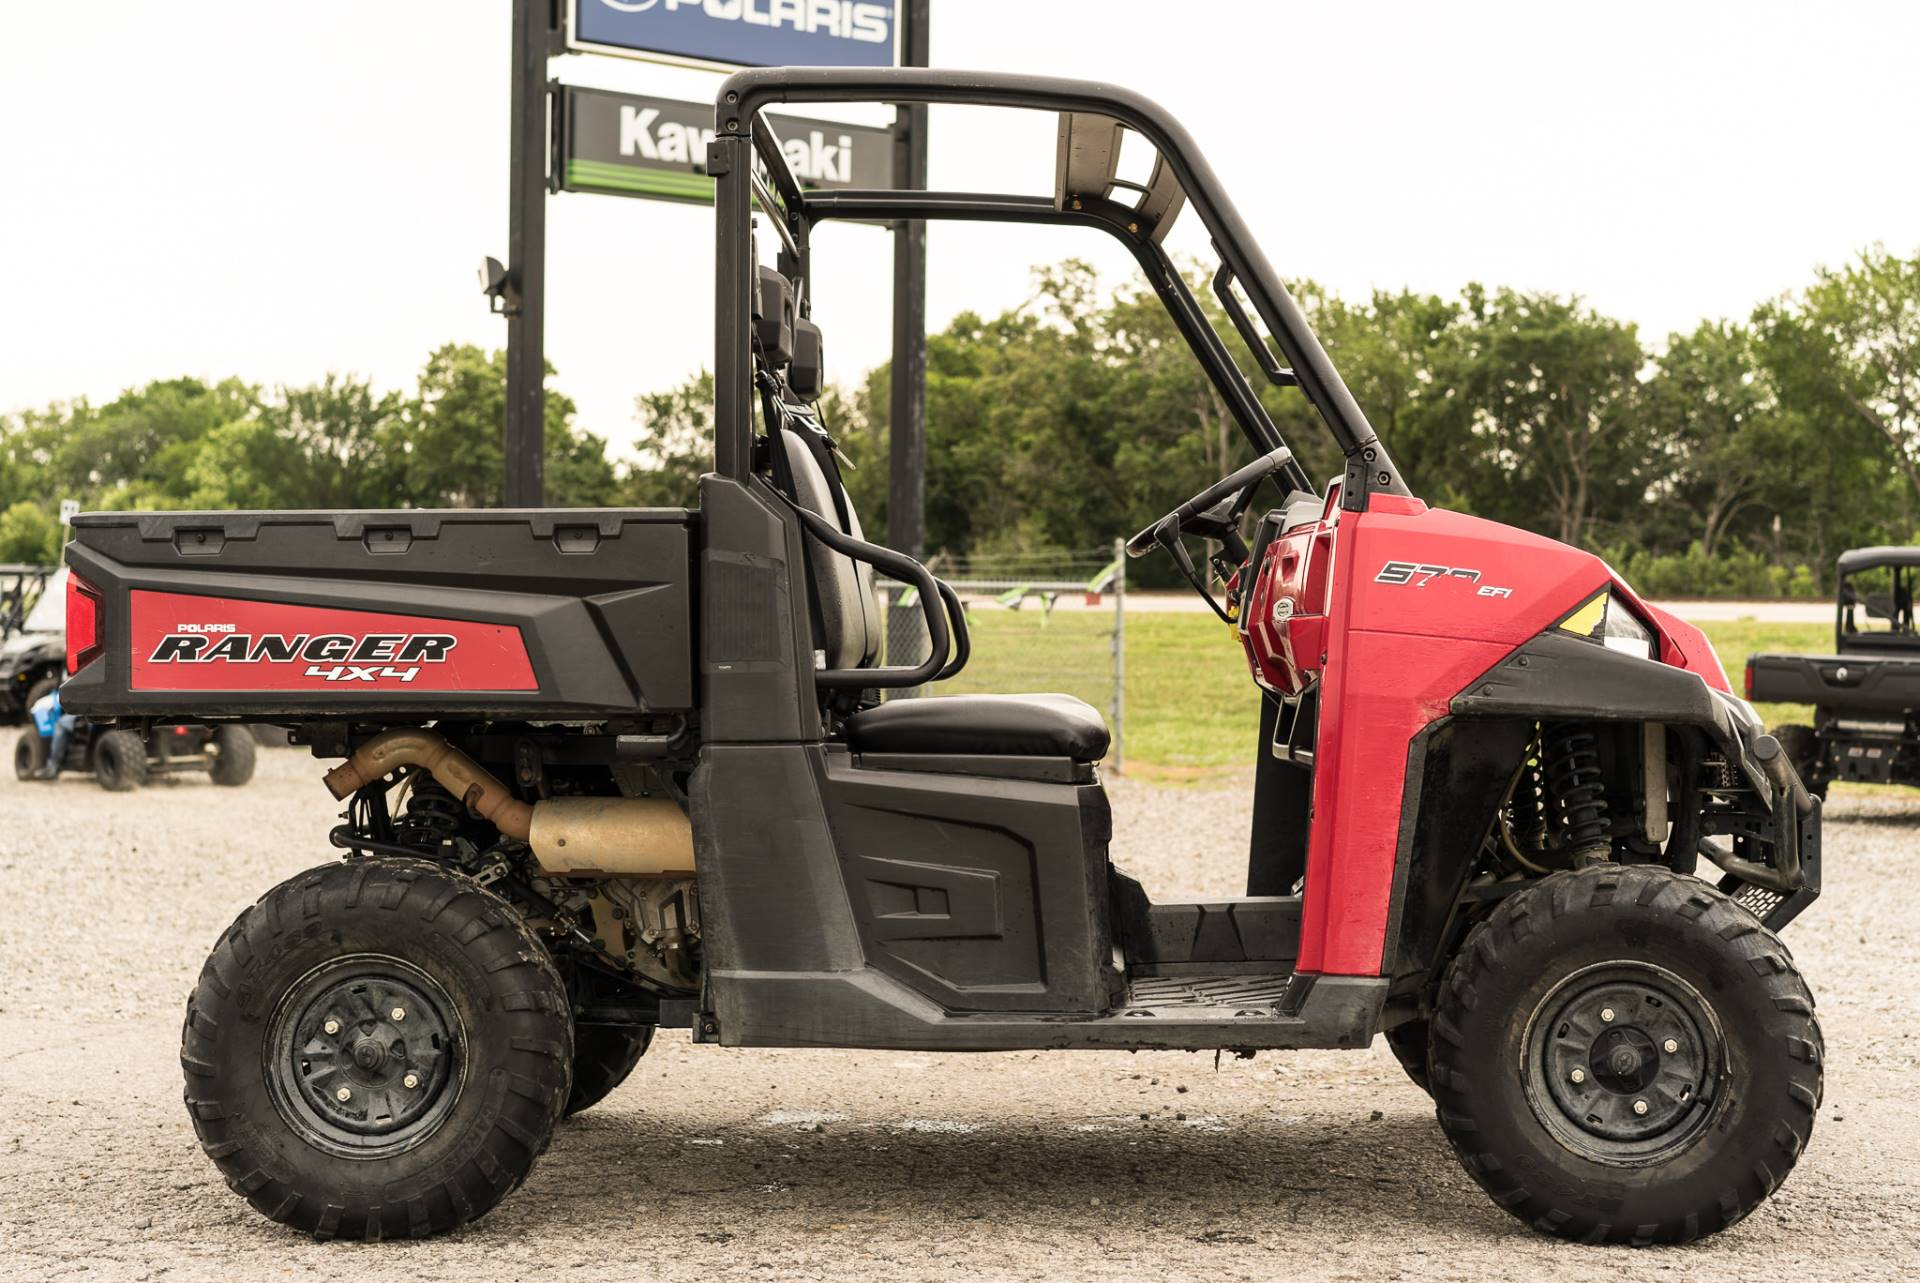 2015 Polaris Ranger570 Full Size 1